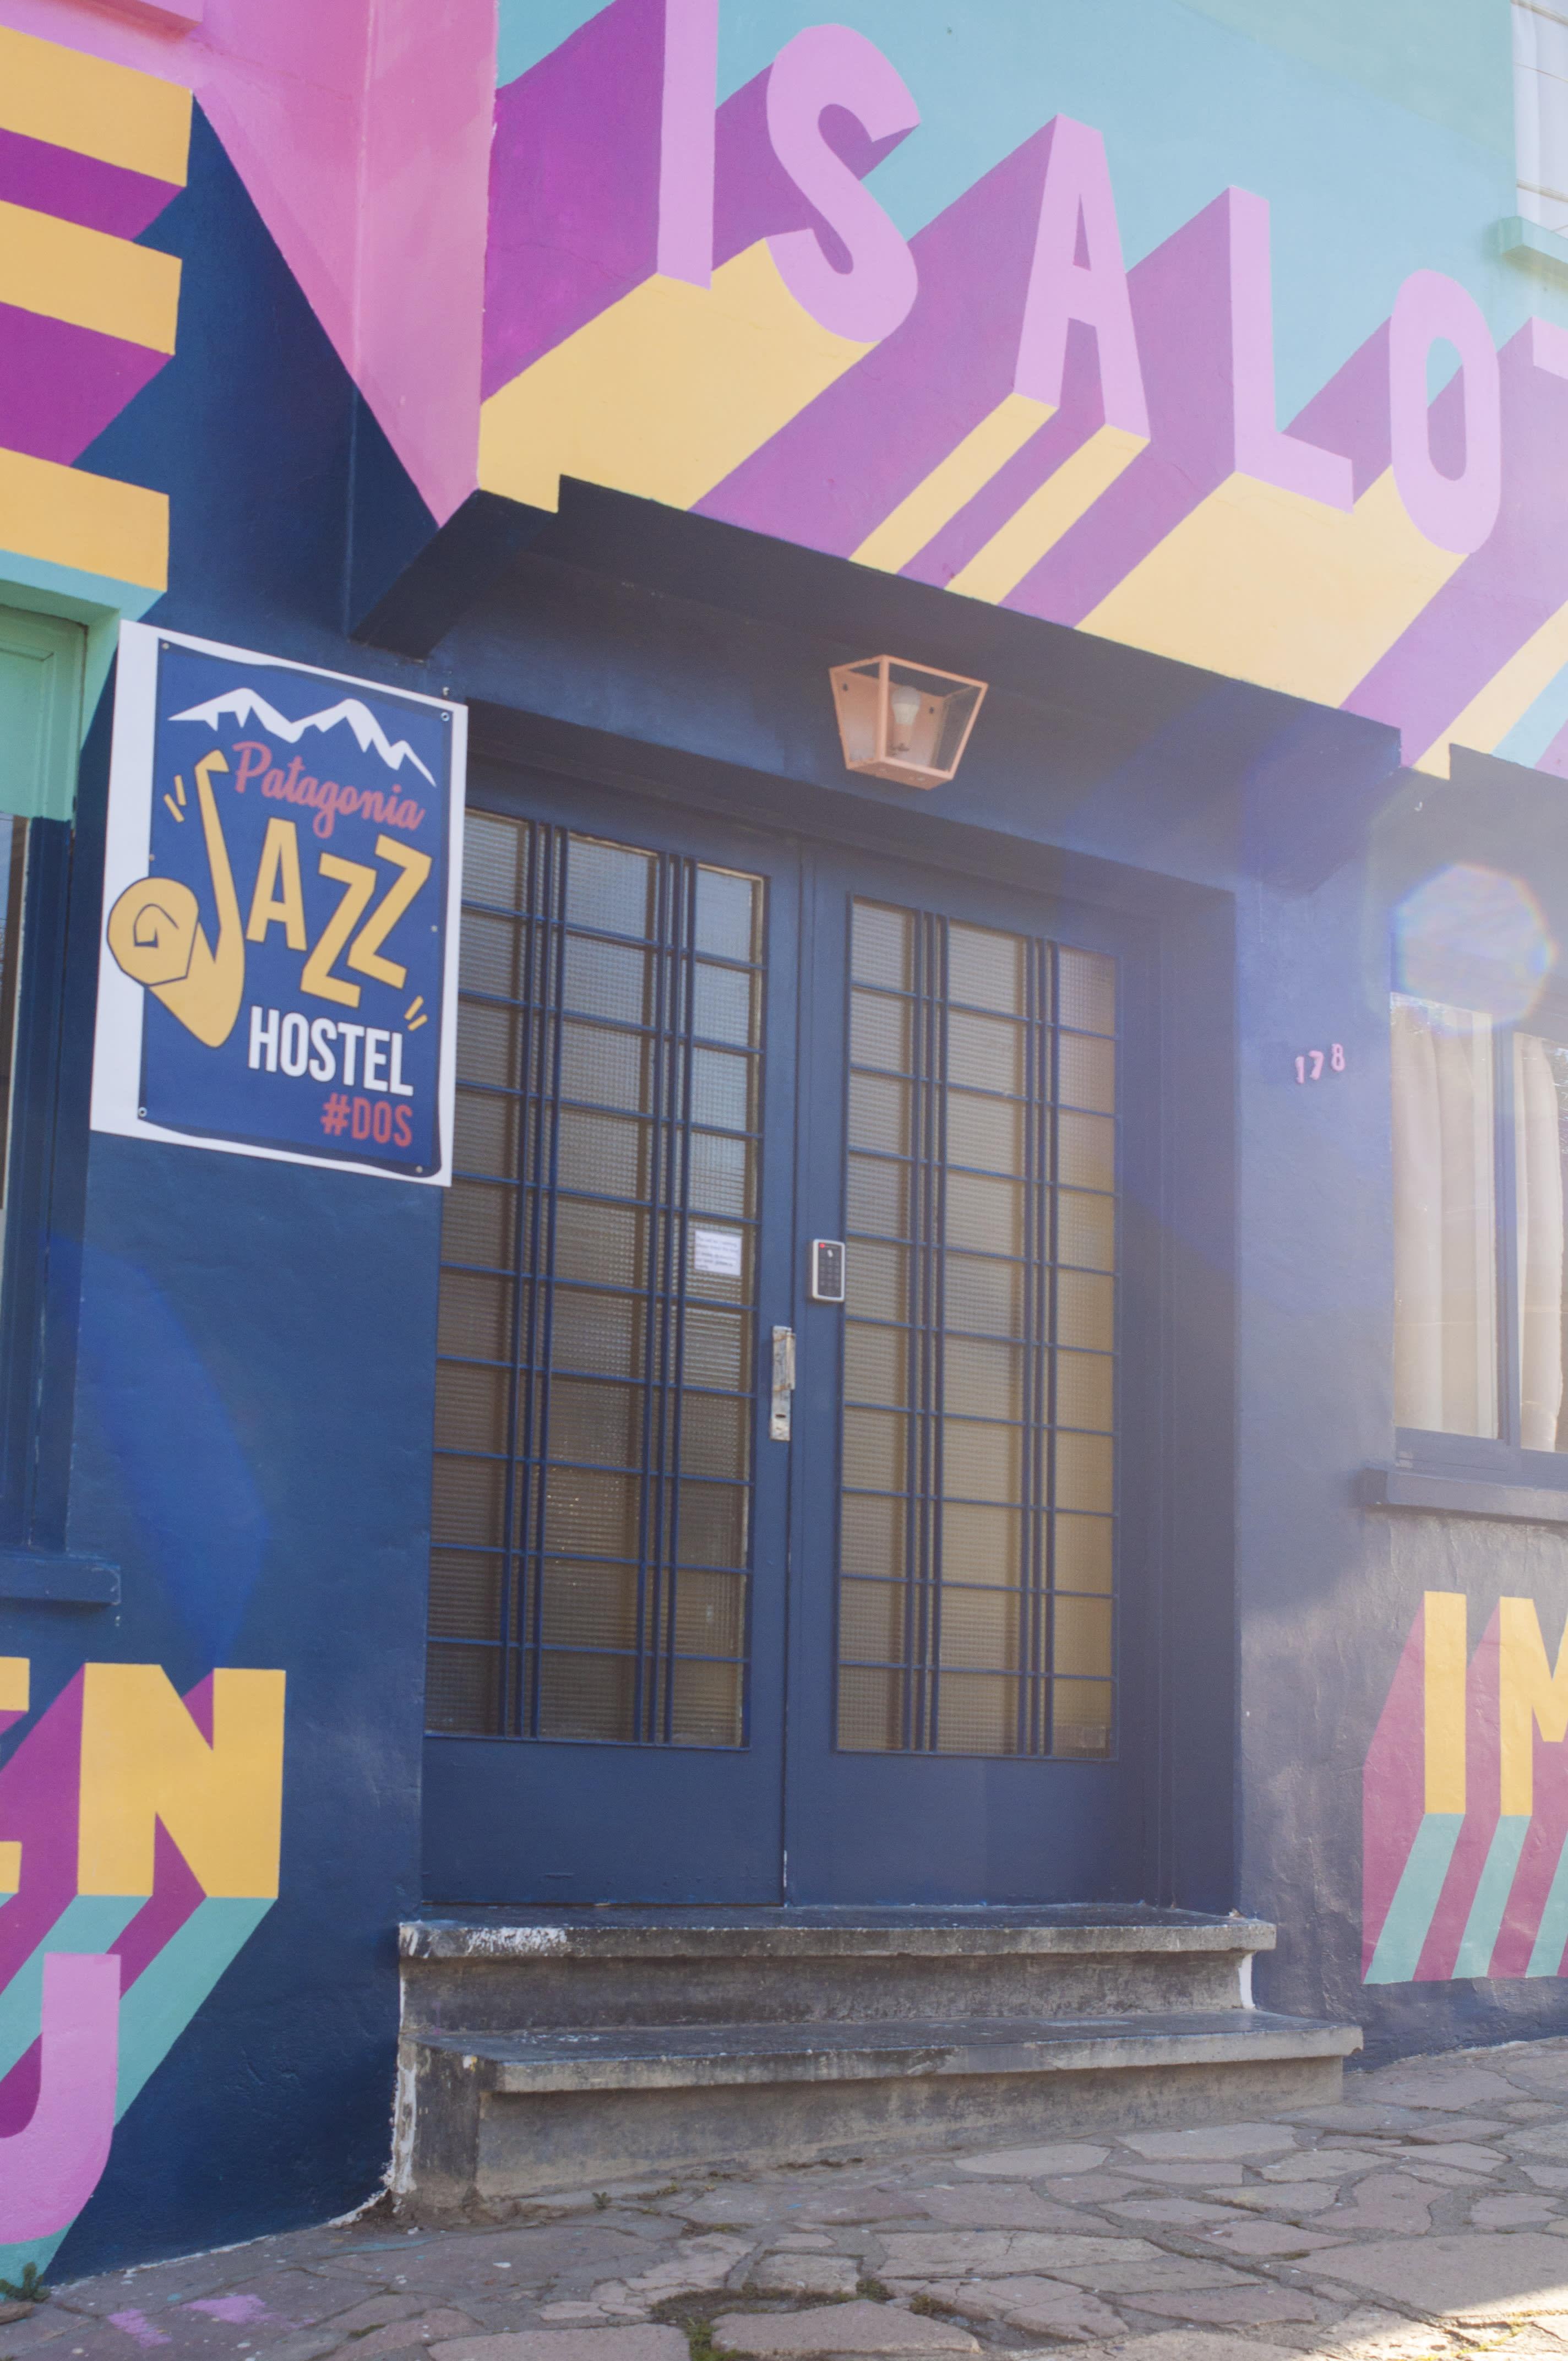 HOSTEL - Patagonia Jazz Hostel 2